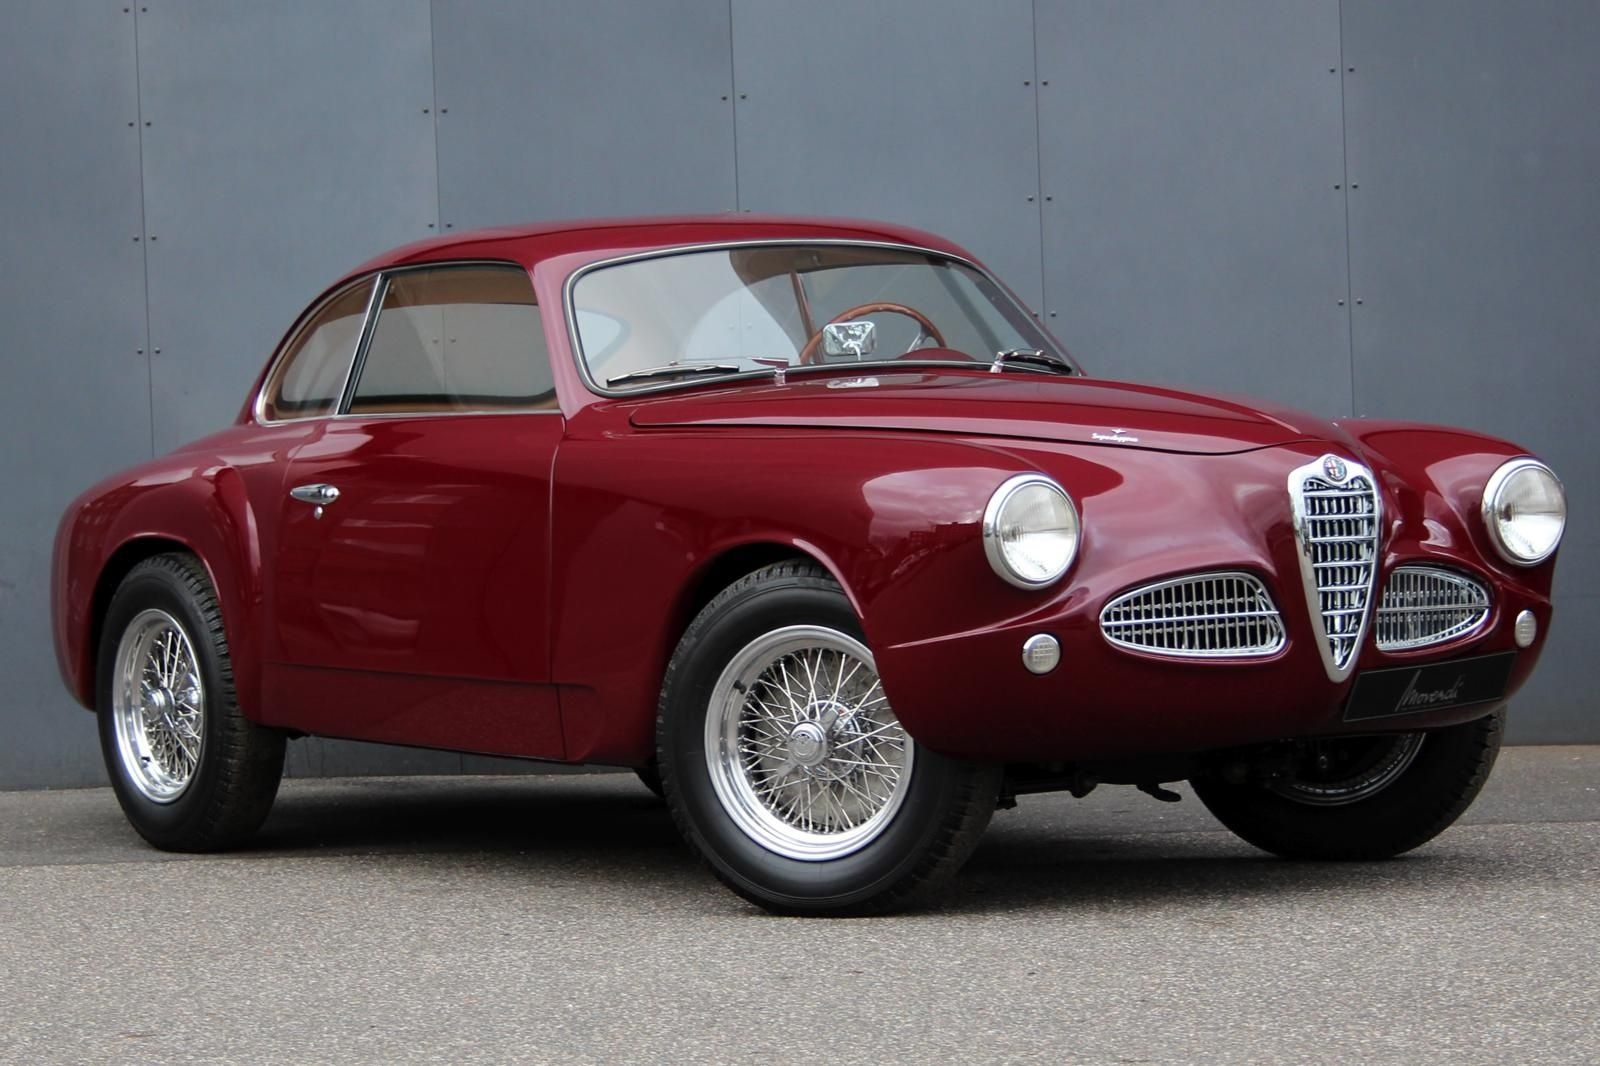 Pin By Xavi Barrera On Alfa Romeo Alfa Romeo Classic Cars Alfa Romeo Cars